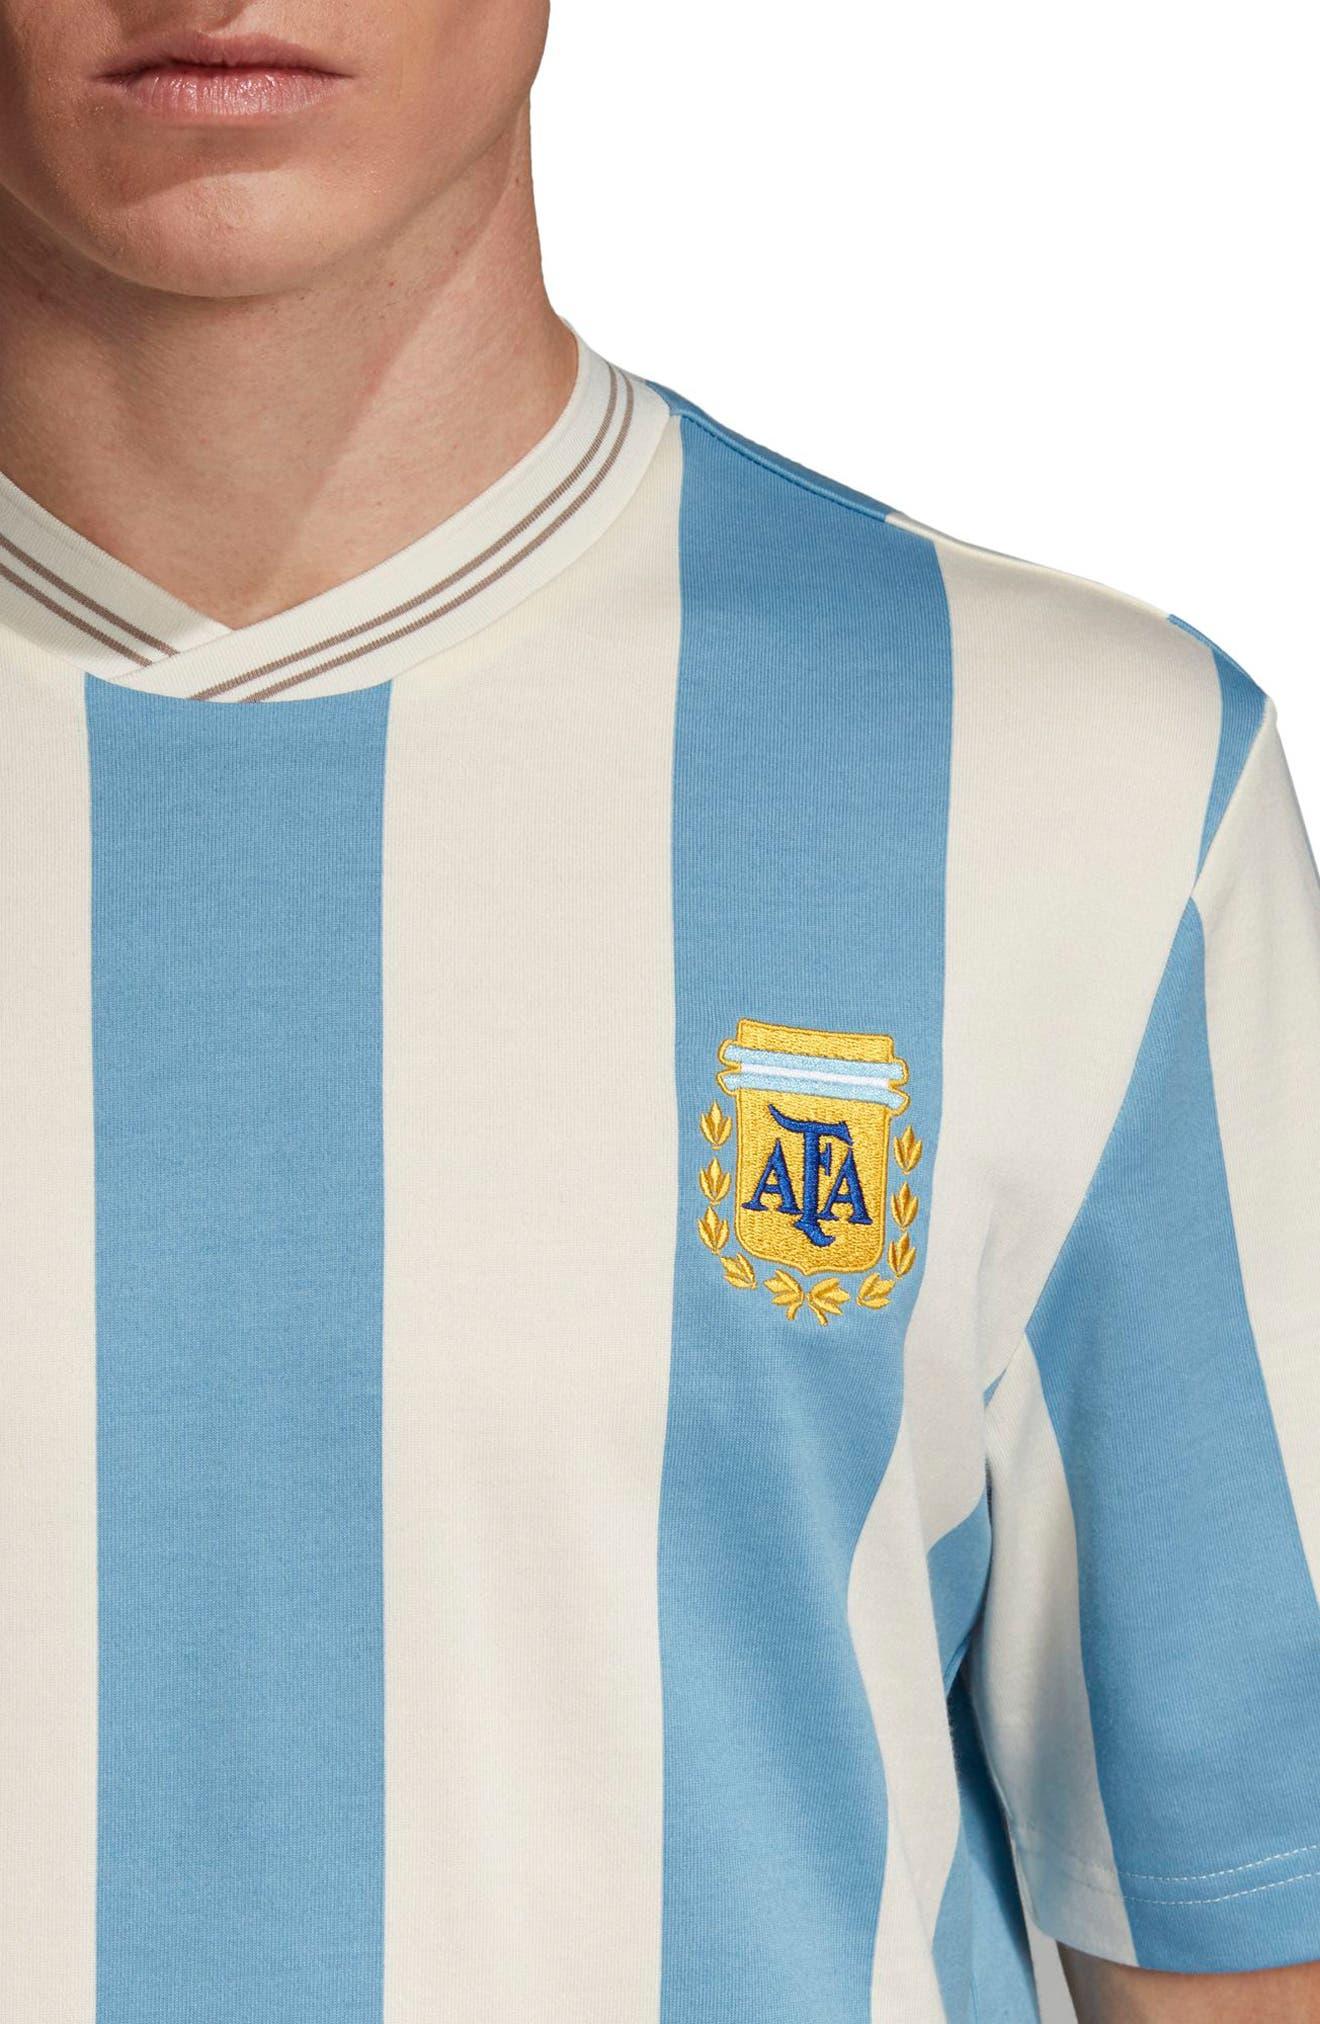 Argentina Mash-Up Jersey,                             Alternate thumbnail 4, color,                             410